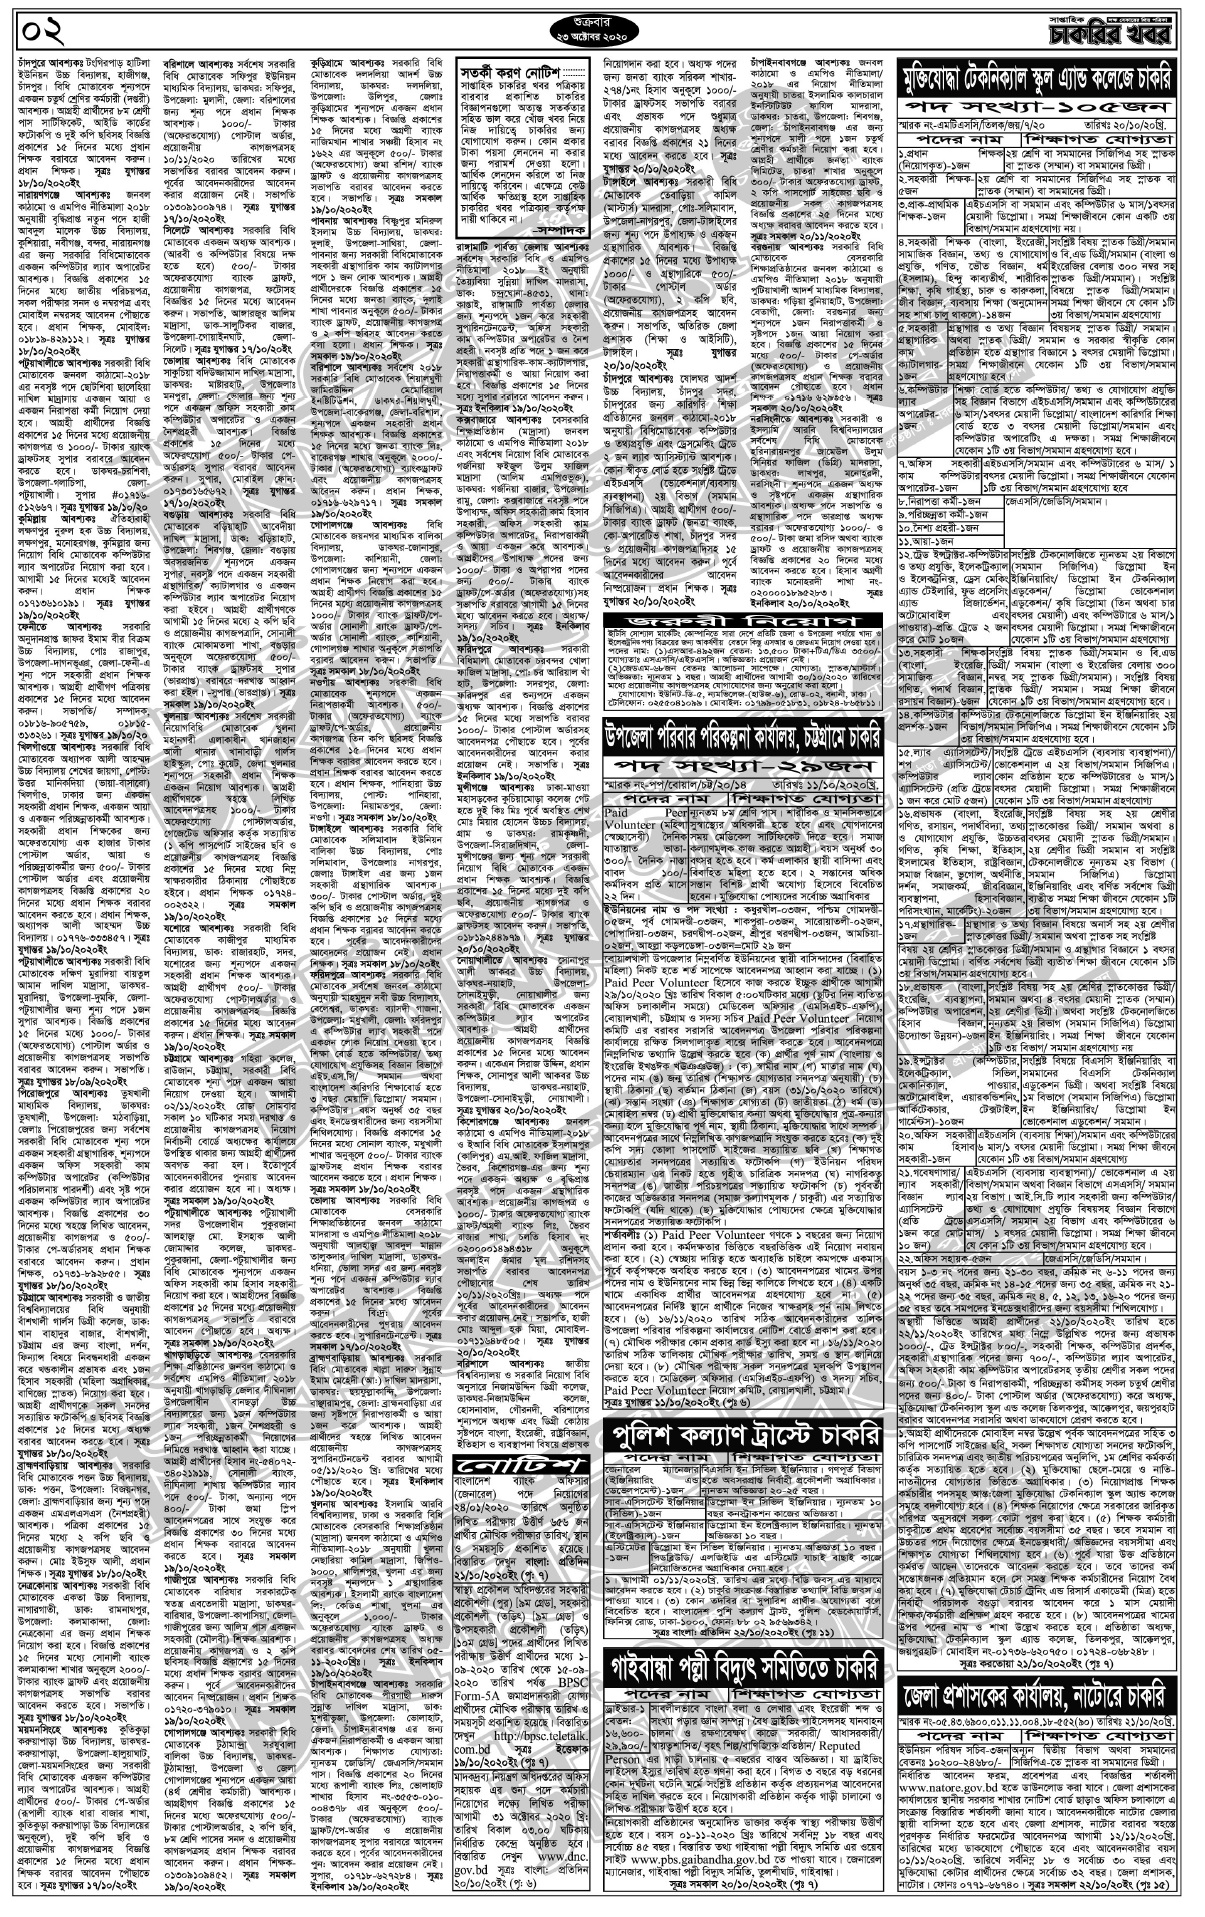 Saptahik Chakrir Khobor Newspaper 23/10/2020 সাপ্তাহিক চাকরির খবর পত্রিকা ২৩/১০/২০২০ pdf Download